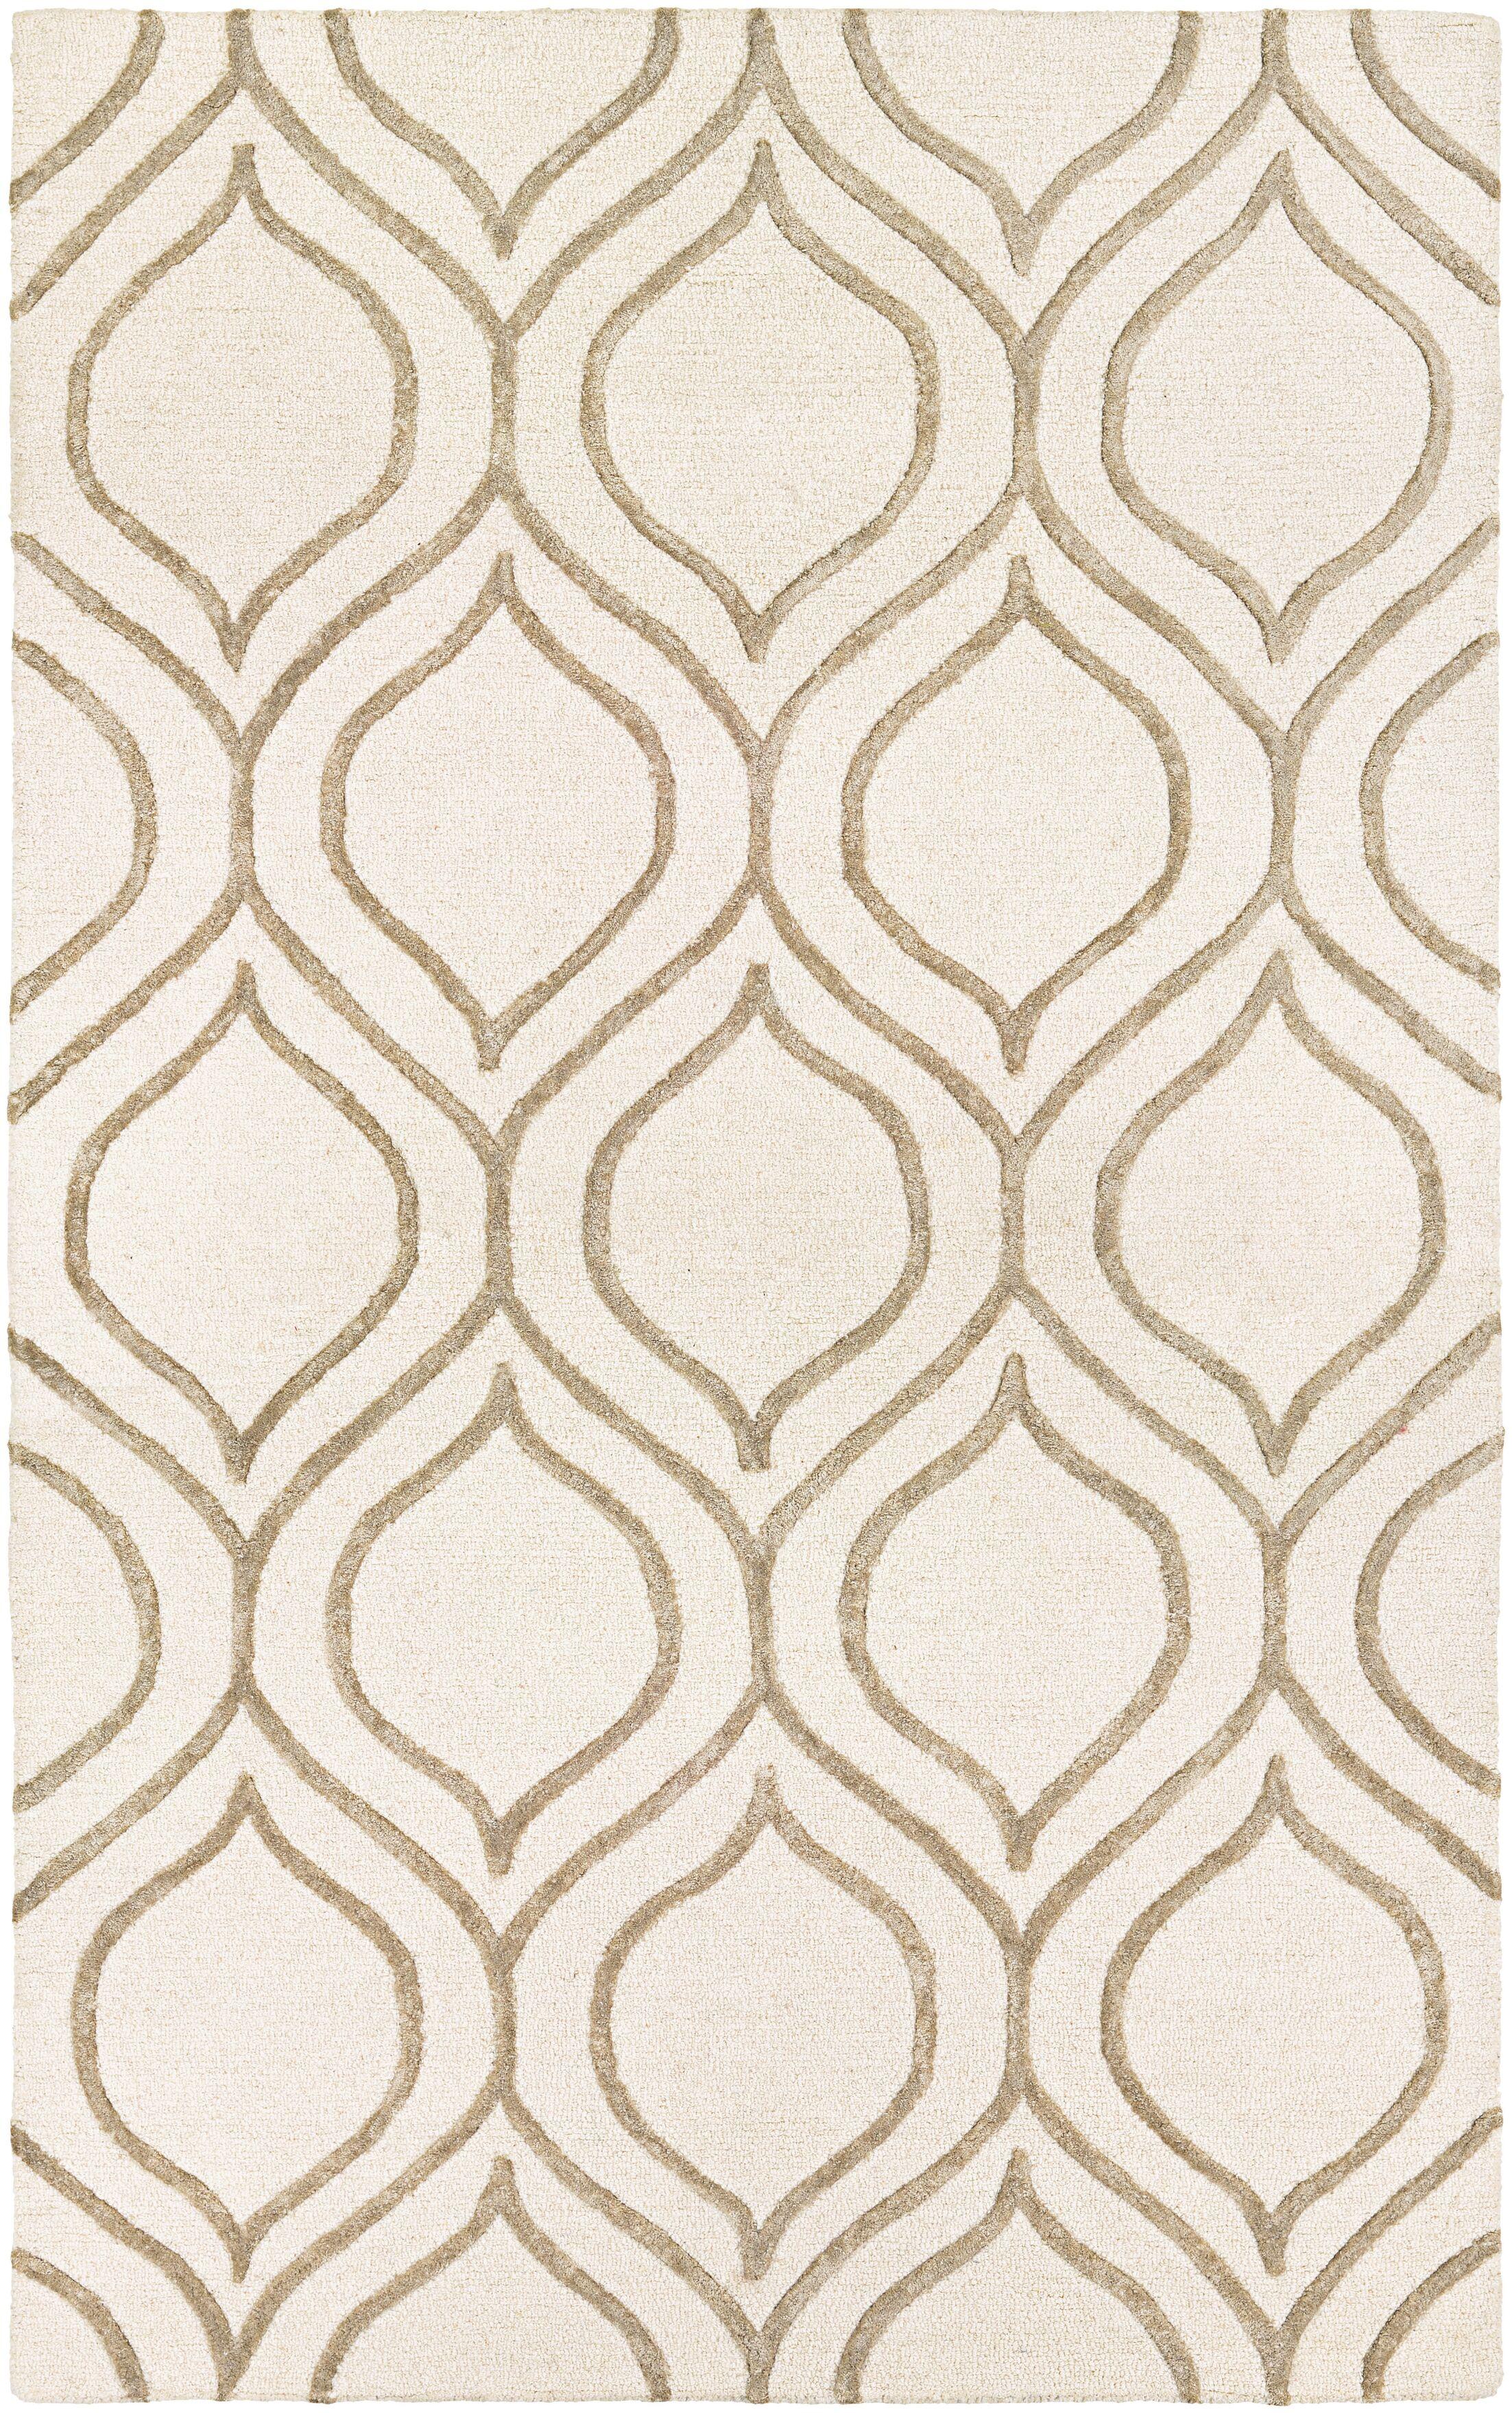 Devorah Hand-Woven Ivory/Gray Area Rug Rug Size: Rectangle 3'6